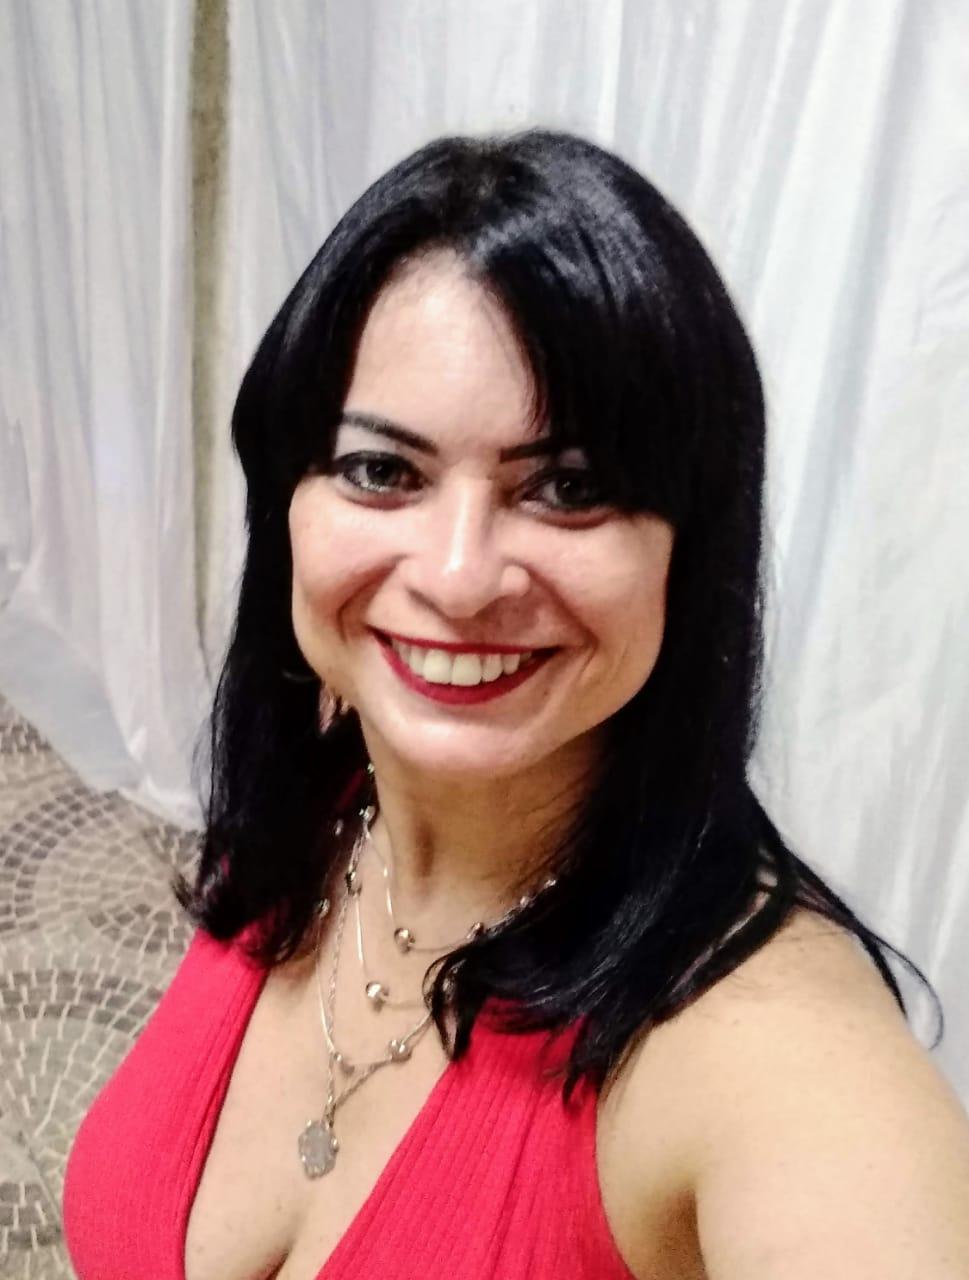 Verônica Nunes - Cliente Mutari